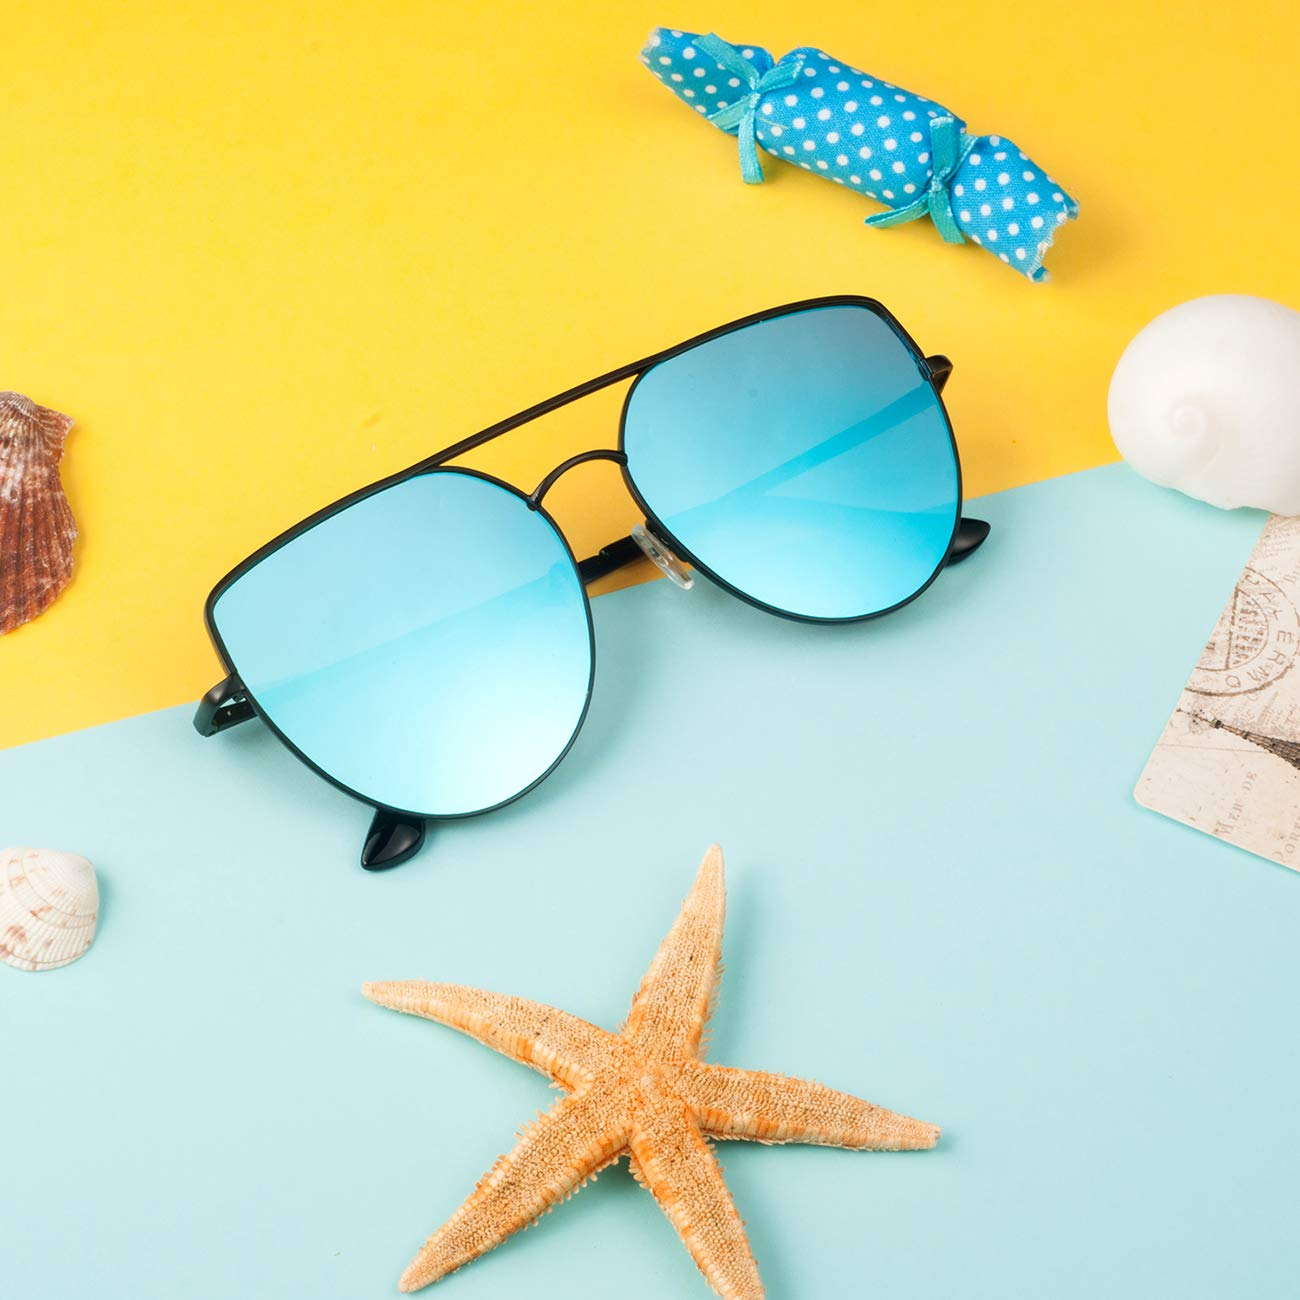 9ca129b60 Amazon.com: Oversized Sunglasses for Women- Feirdio Mirrored Cat Eye  Sunglasses Metal Frame women sunglasses 2269 (black Frame/blue Mirrored  Lens, ...